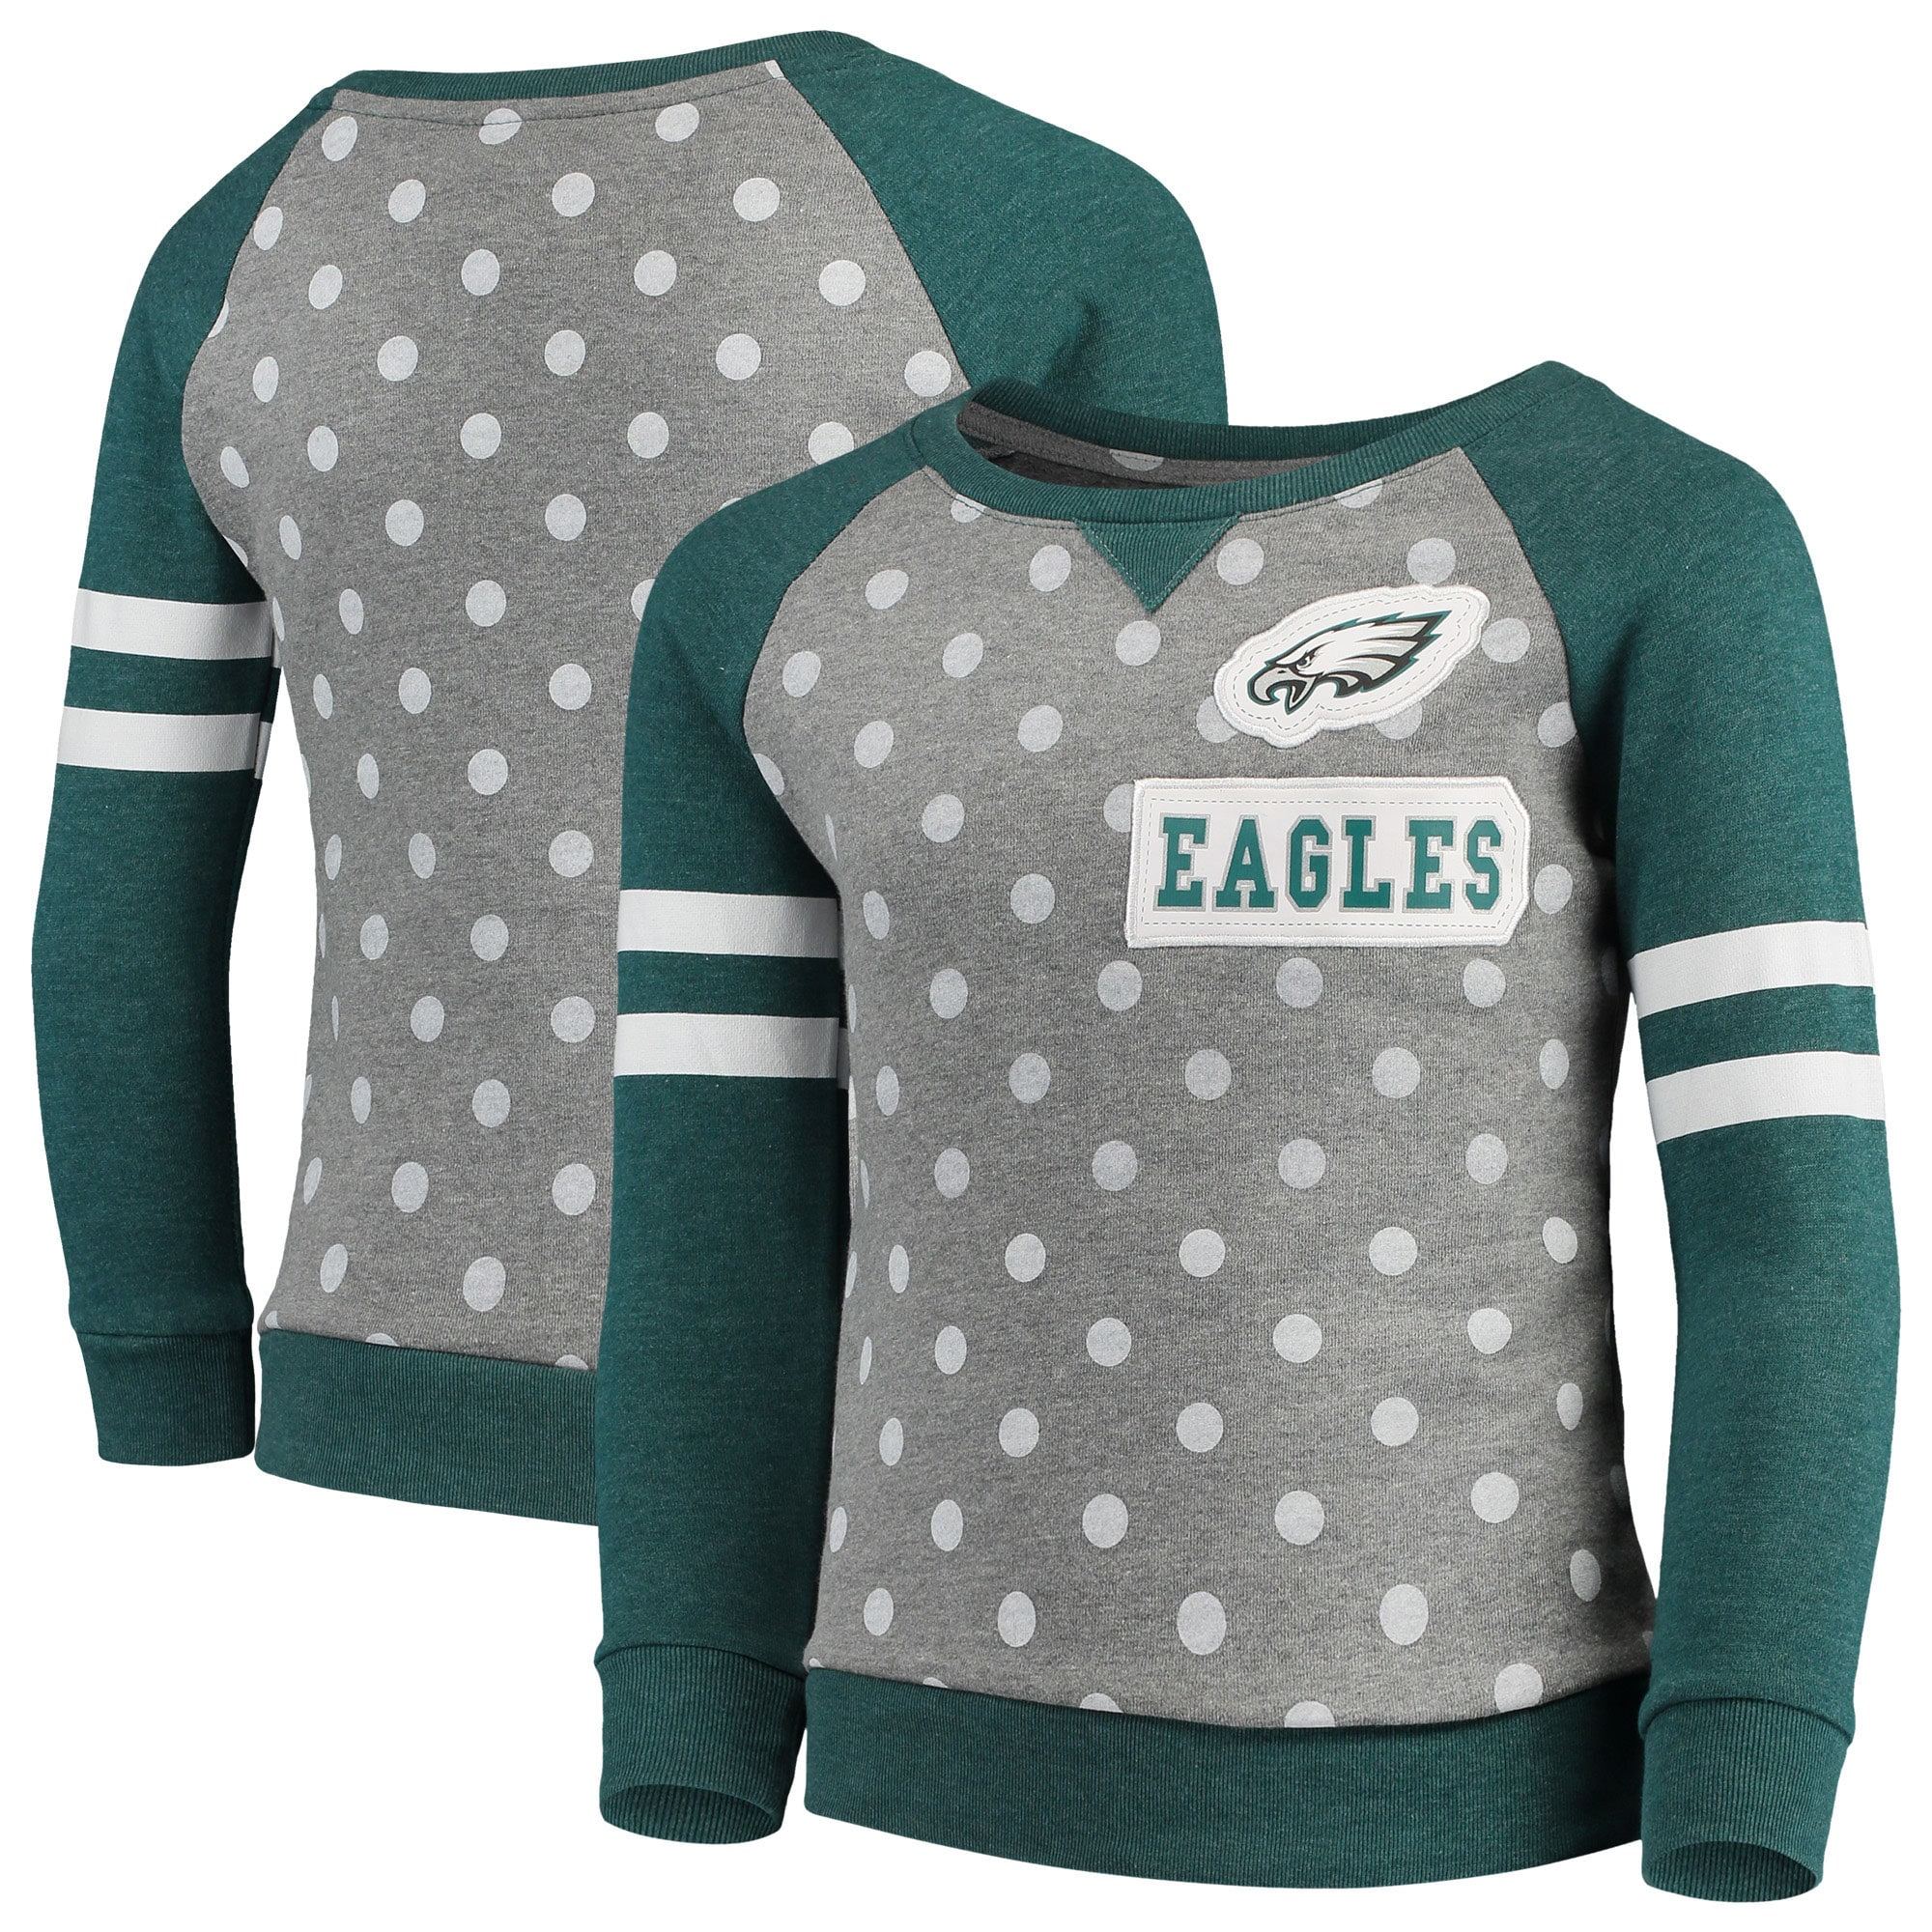 Philadelphia Eagles OuterStuff NFL Youth Girls Team Logo Polka Dot Print Crew